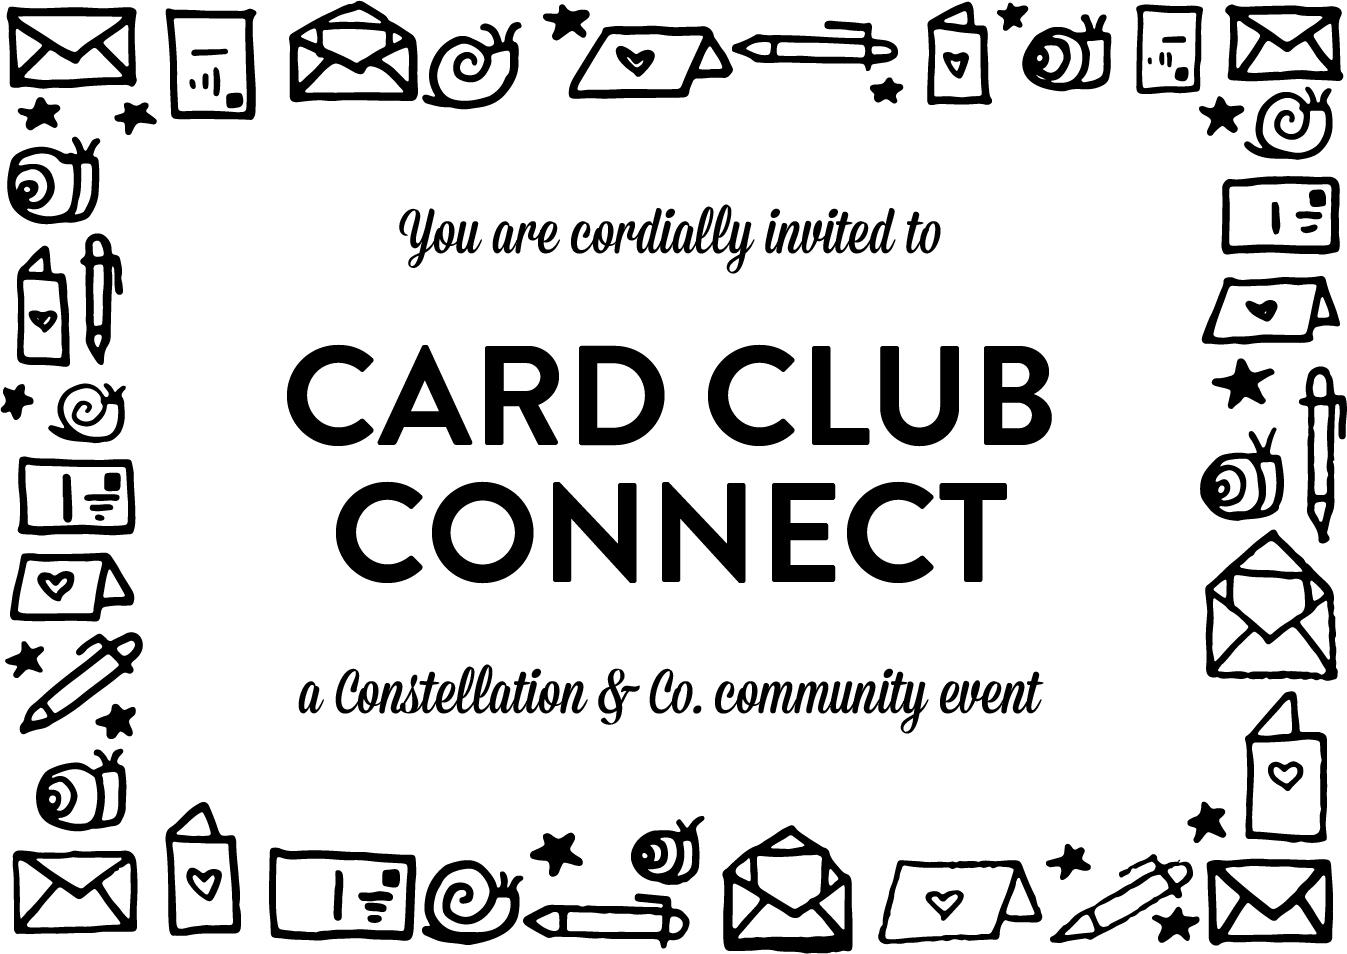 cardclubconnect_invite_banner.jpg